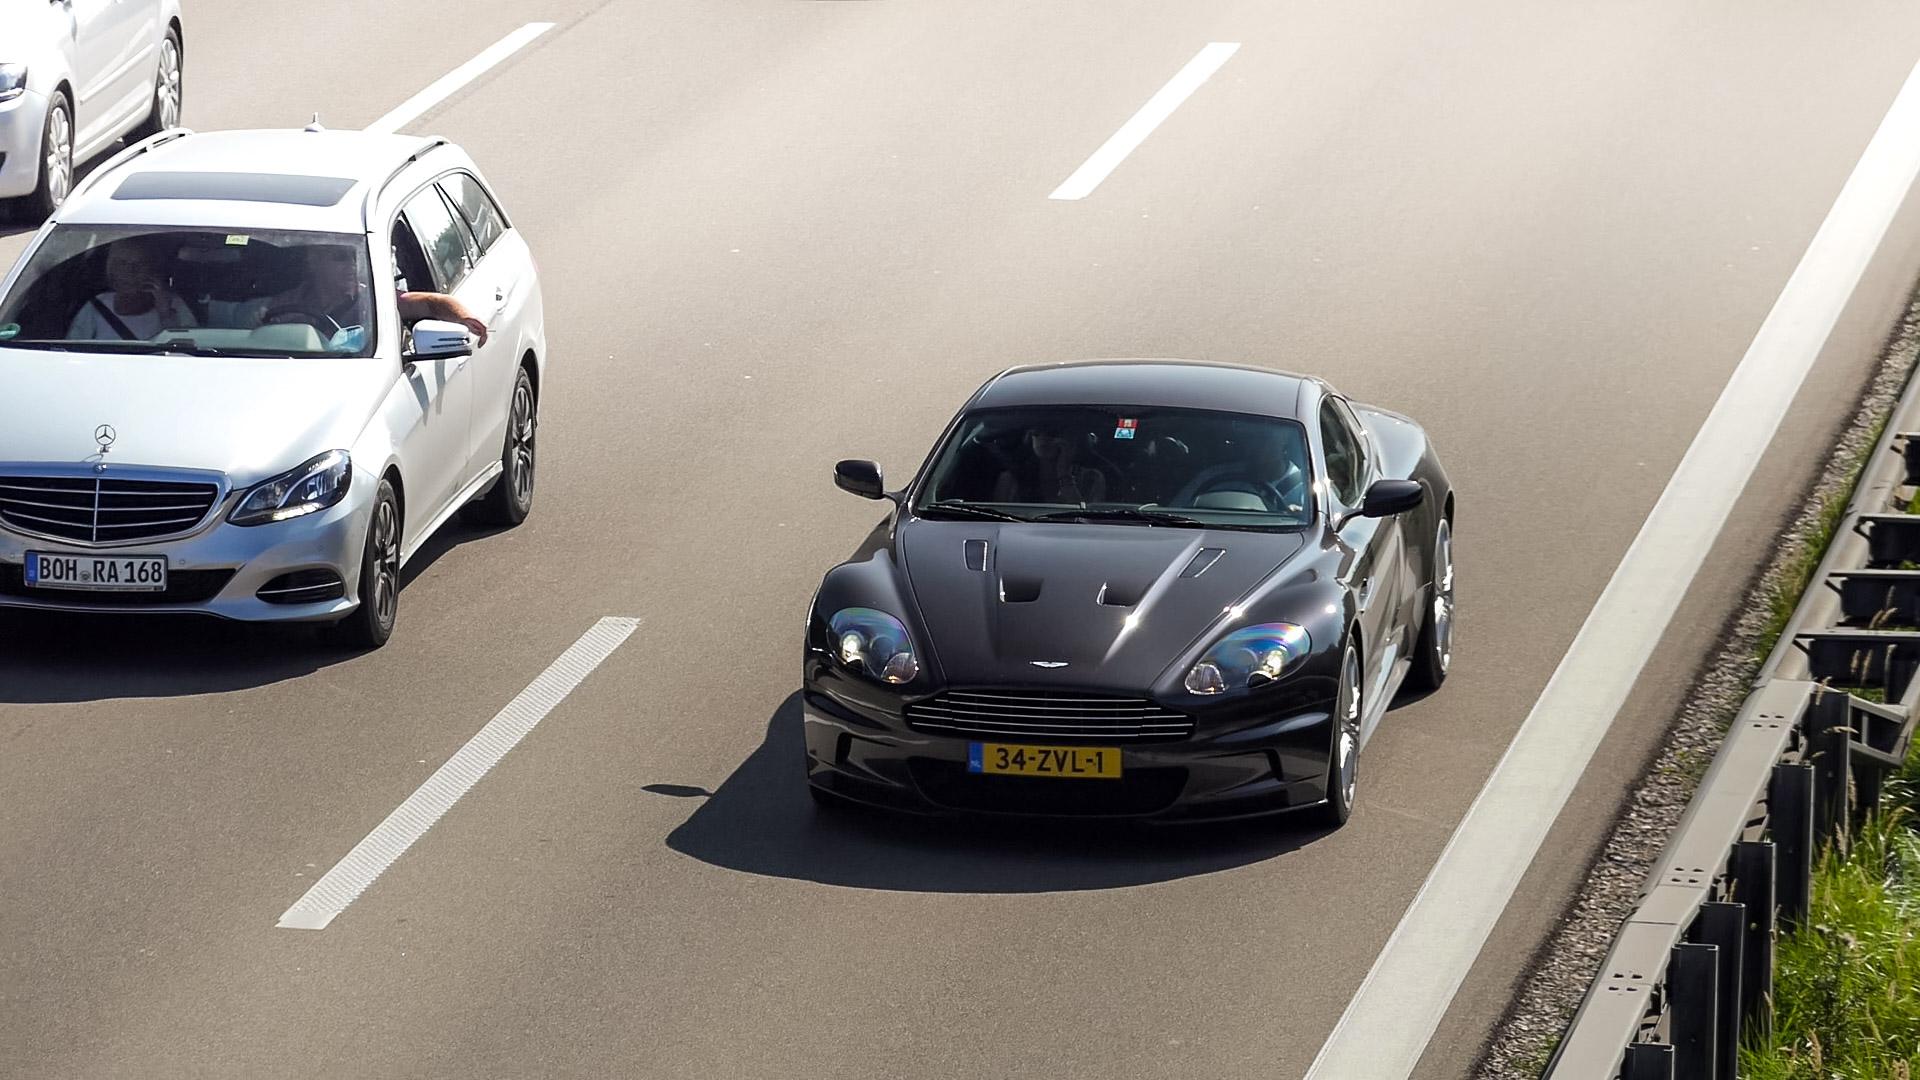 Aston Martin DBS - 34-ZVL-1 (NL)